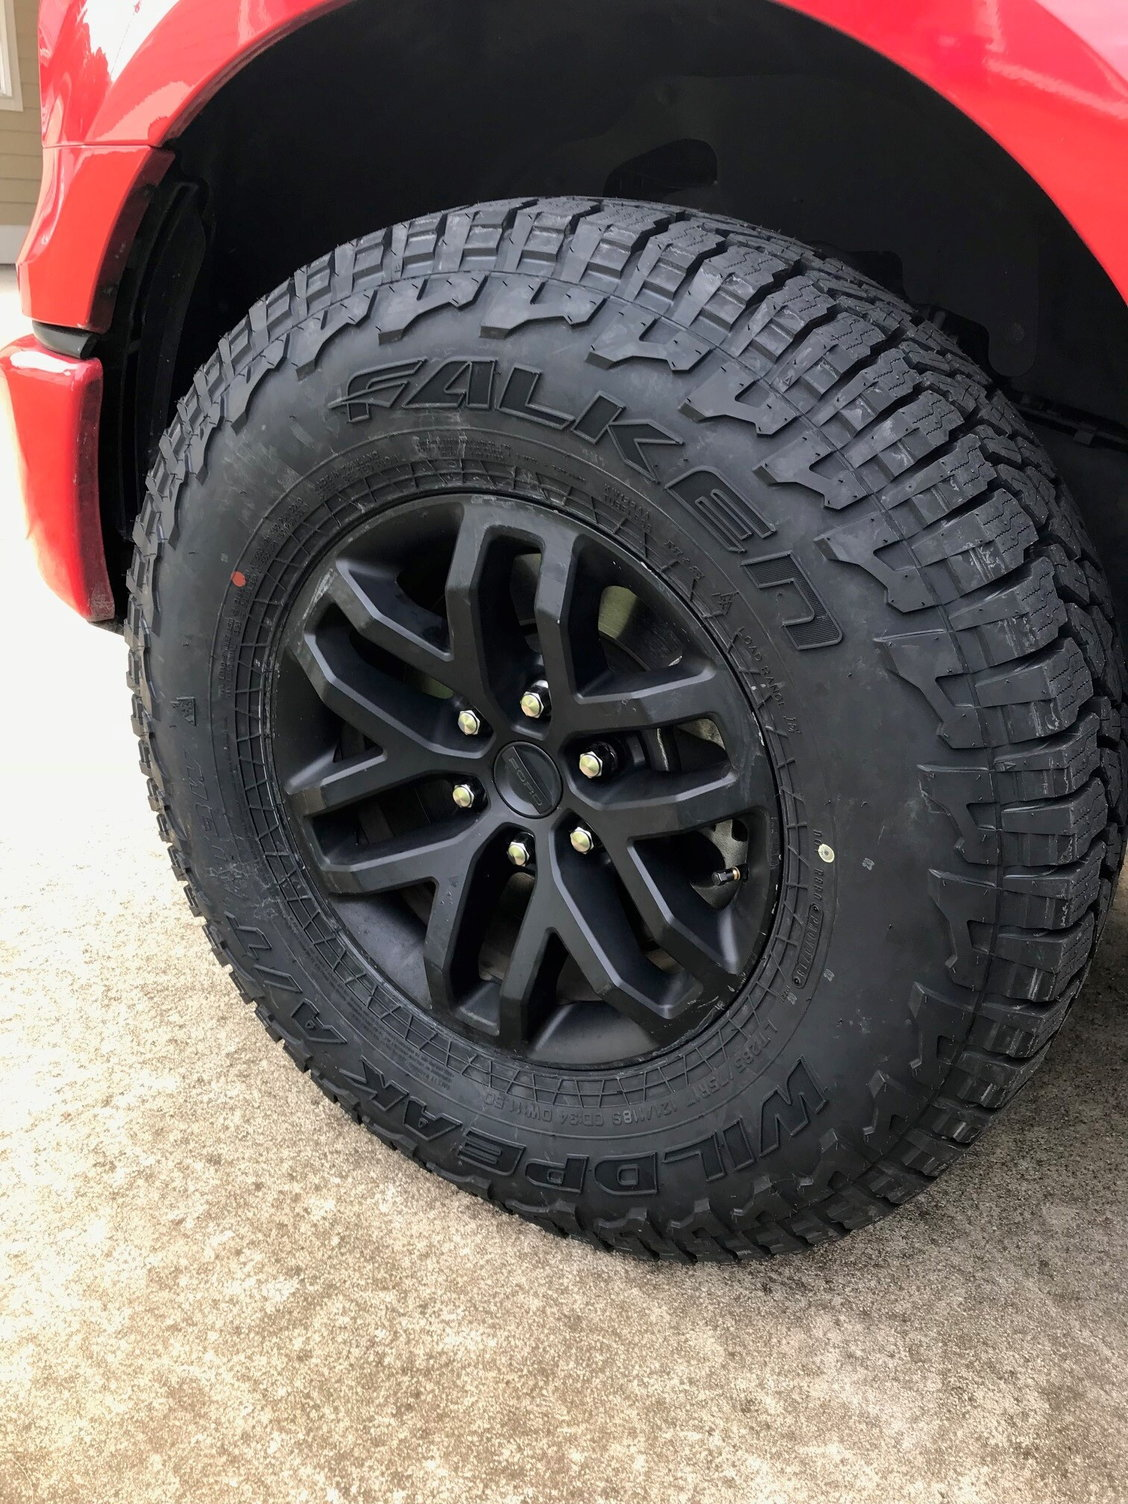 Falken Tires Review >> Falken Wildpeak A/T3W Review - Page 7 - Ford F150 Forum ...